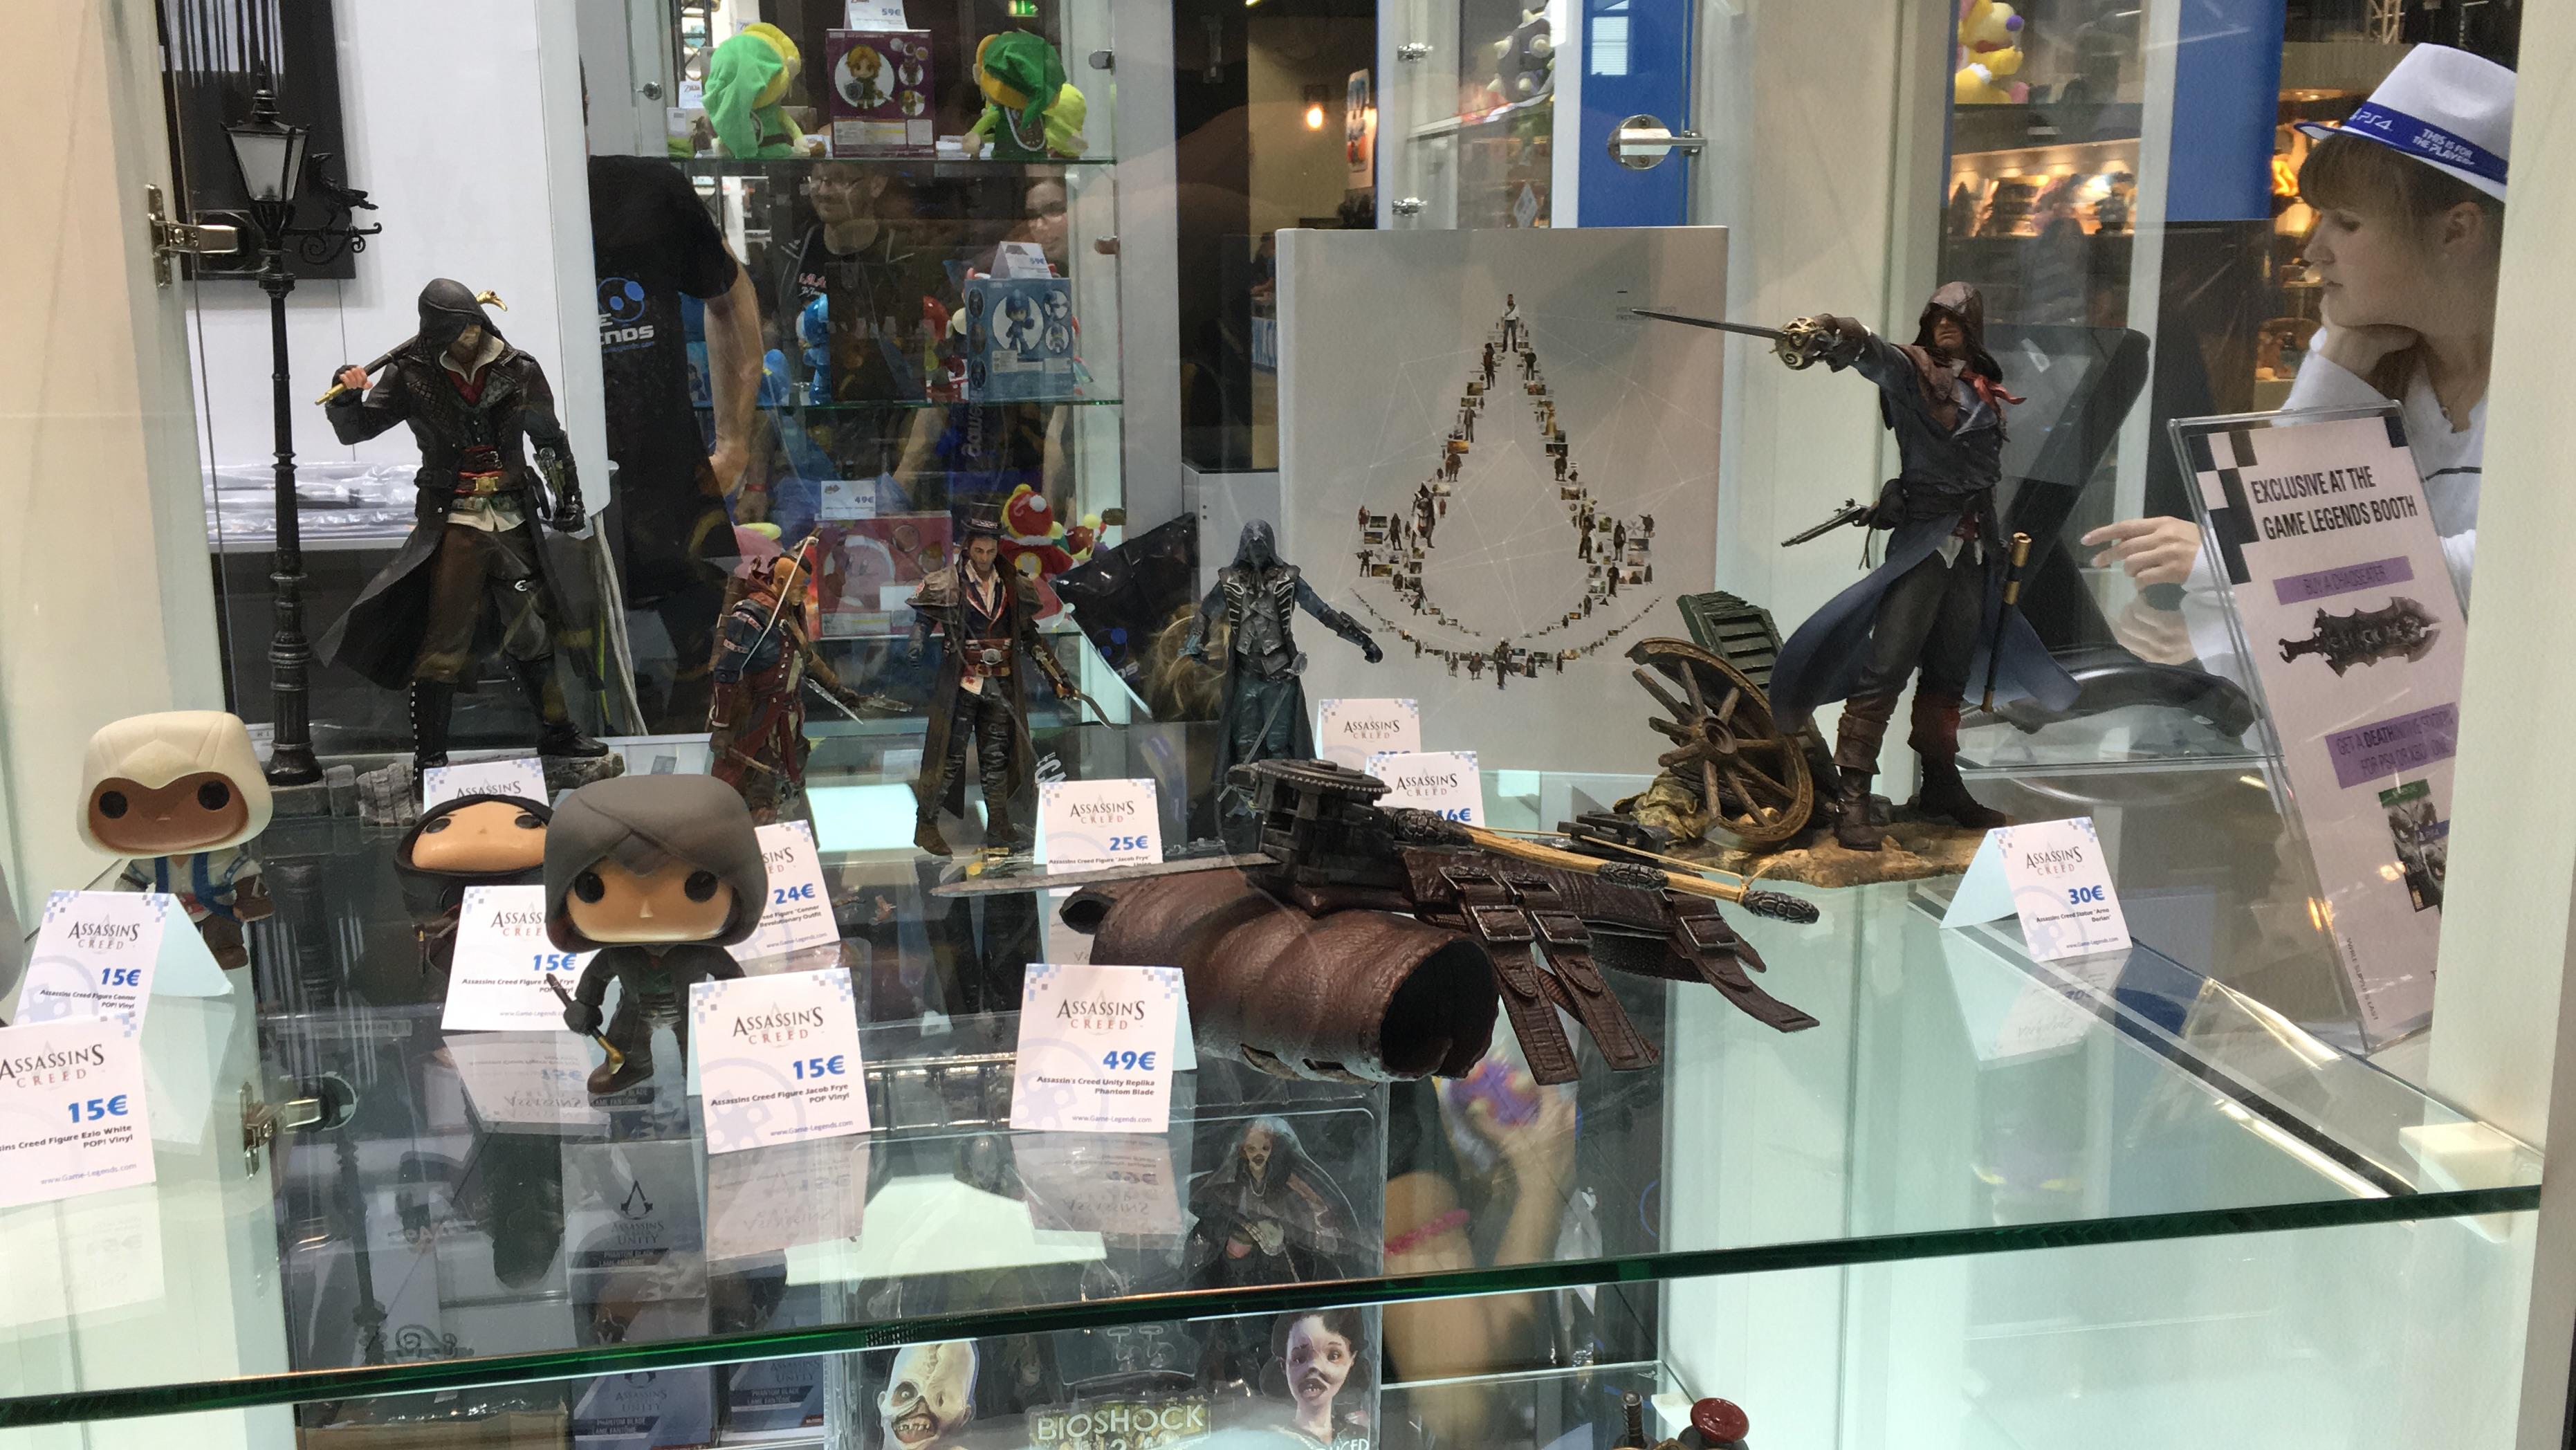 Assassin's Creed Merchandise